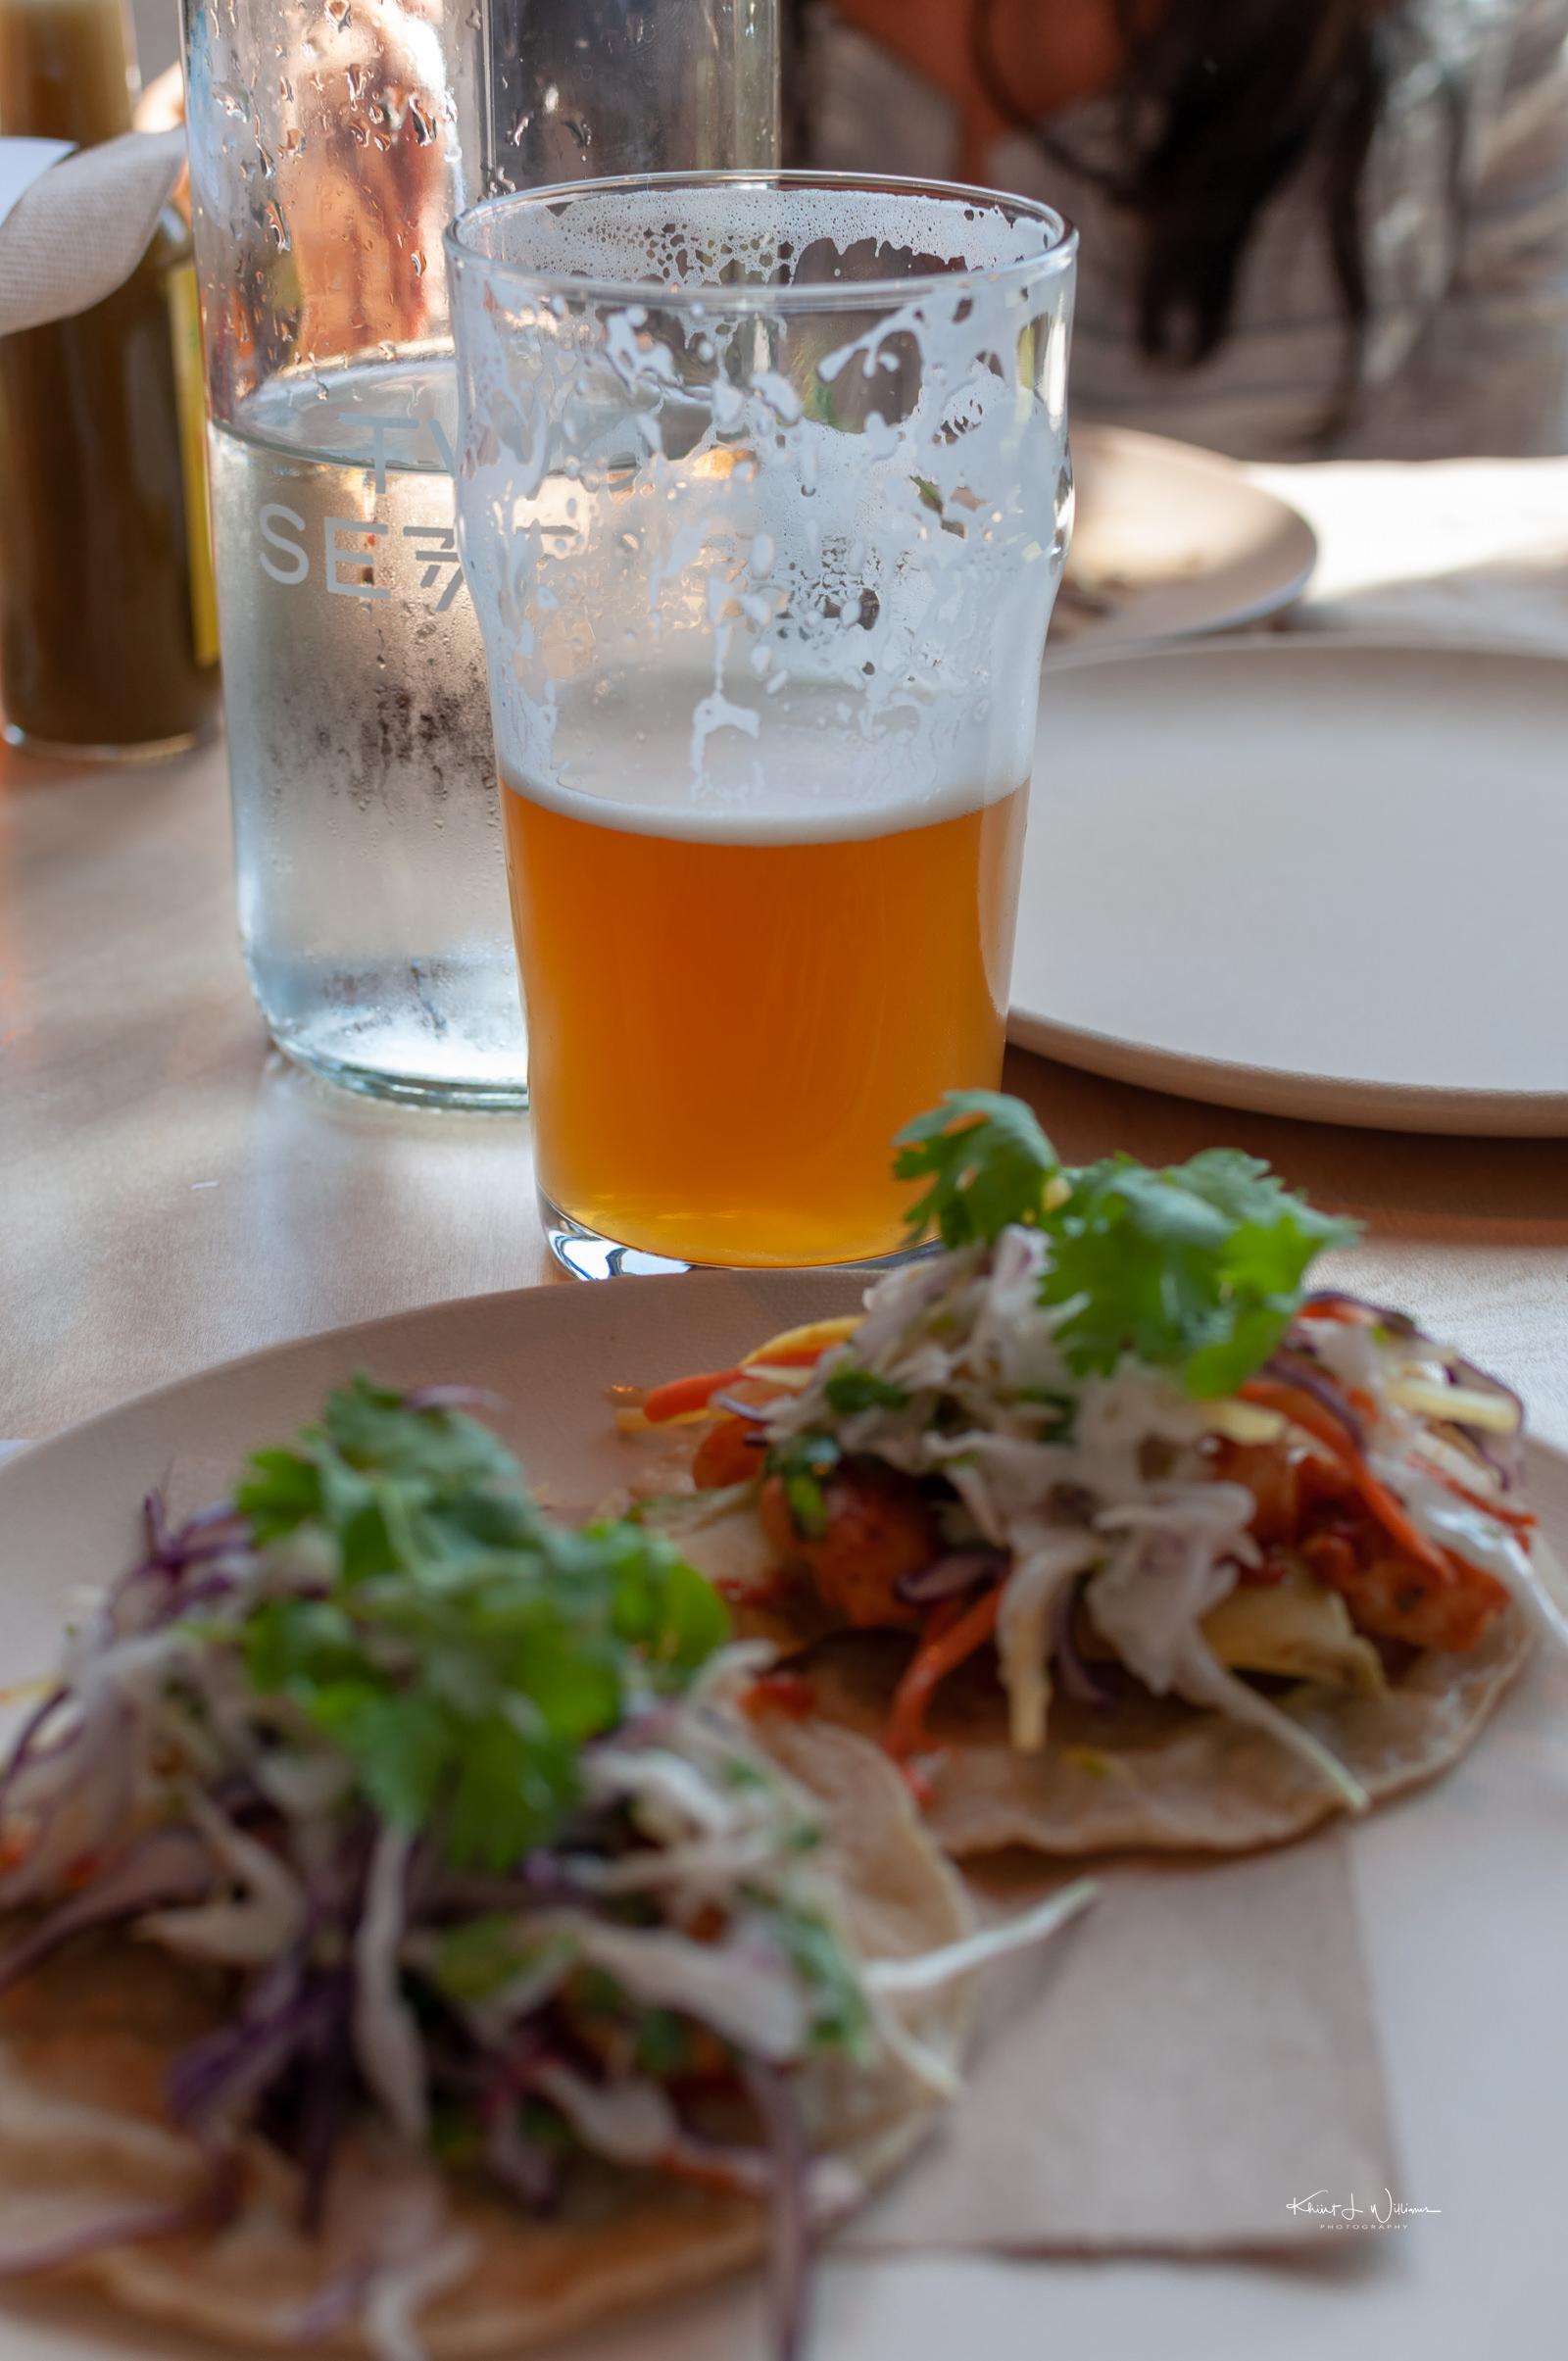 Kane Overhead, IPA, Tacos